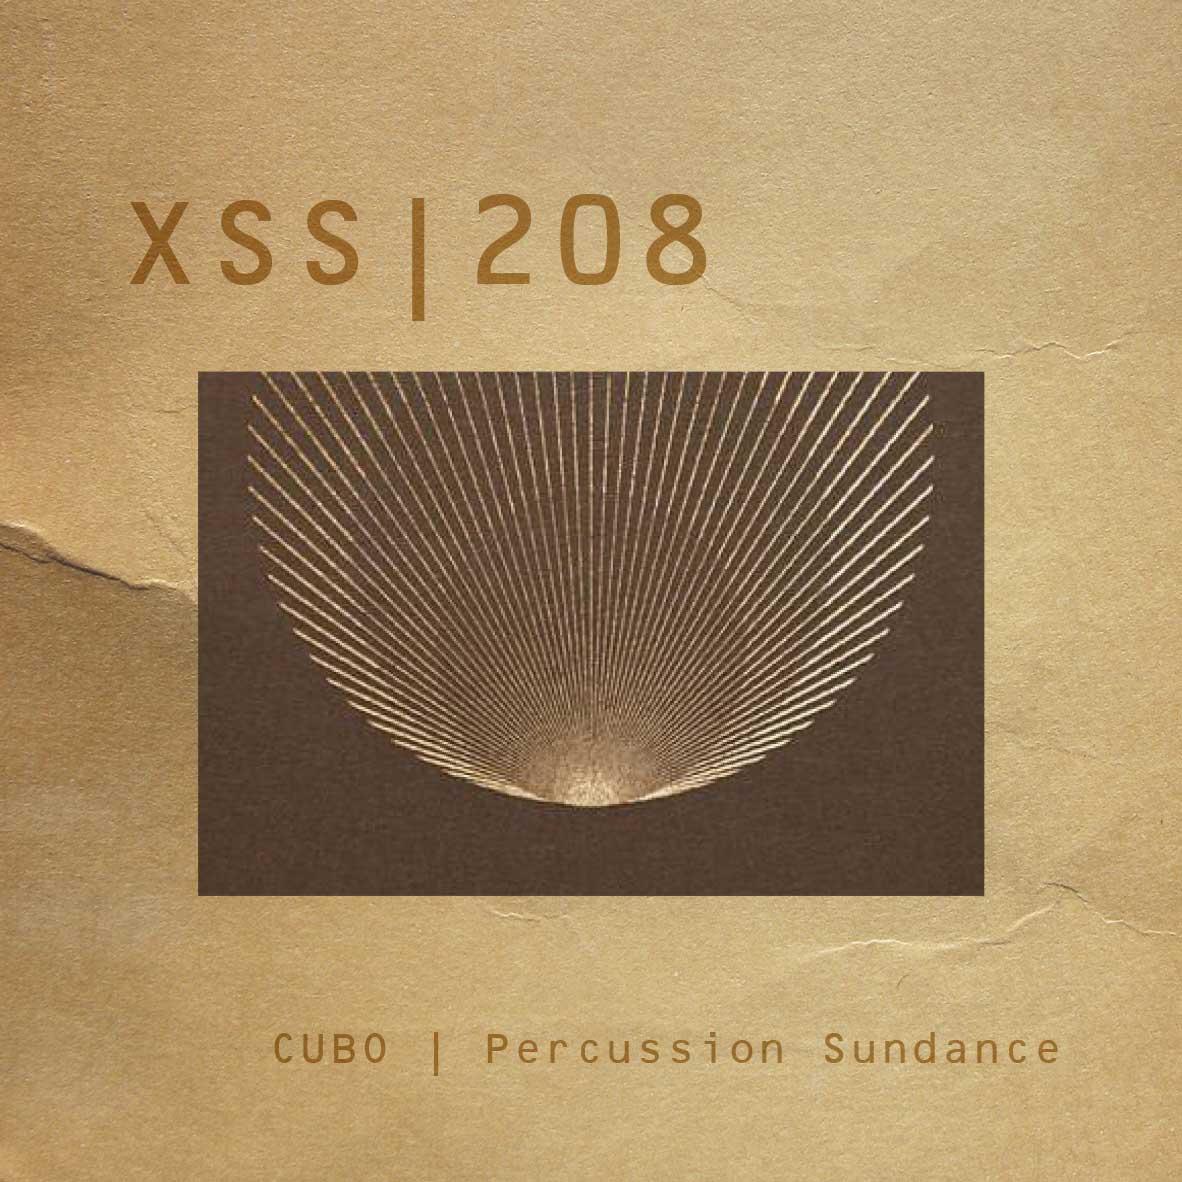 XSS208 | Cubo | Percussion Sundance